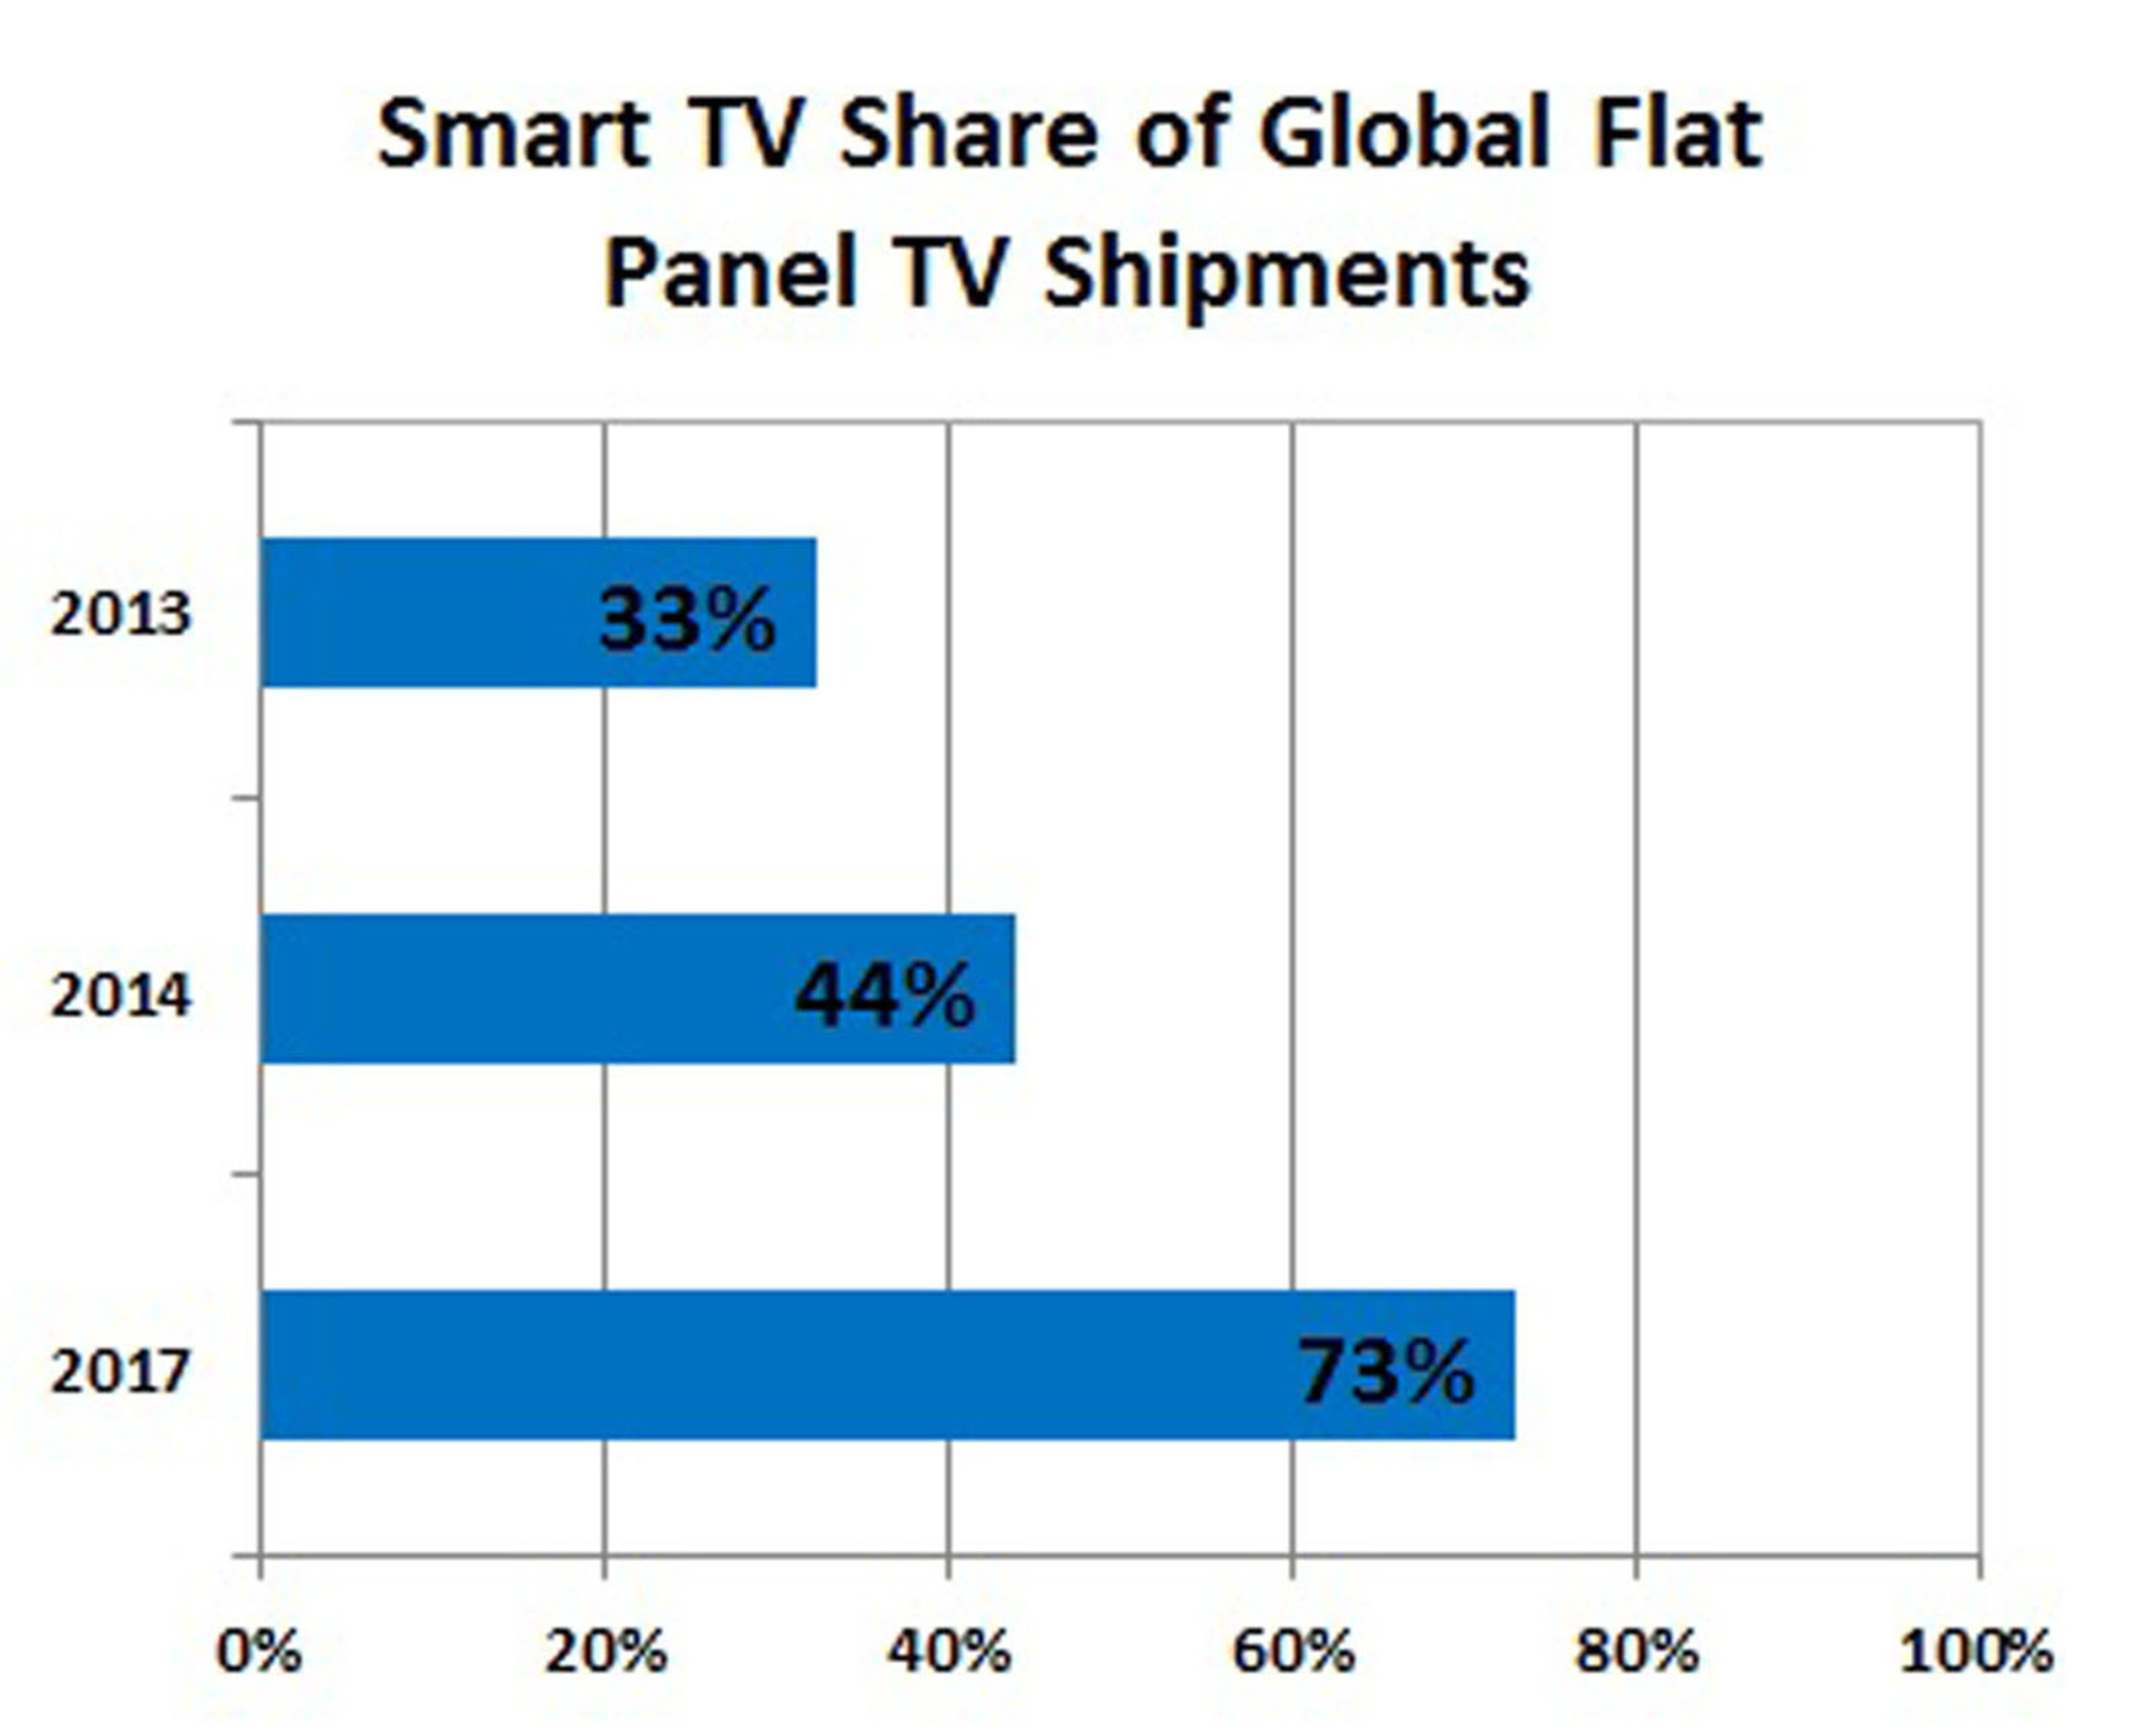 Strategy Analytics: 2013 Smart TV Shipments Grew 55 Percent